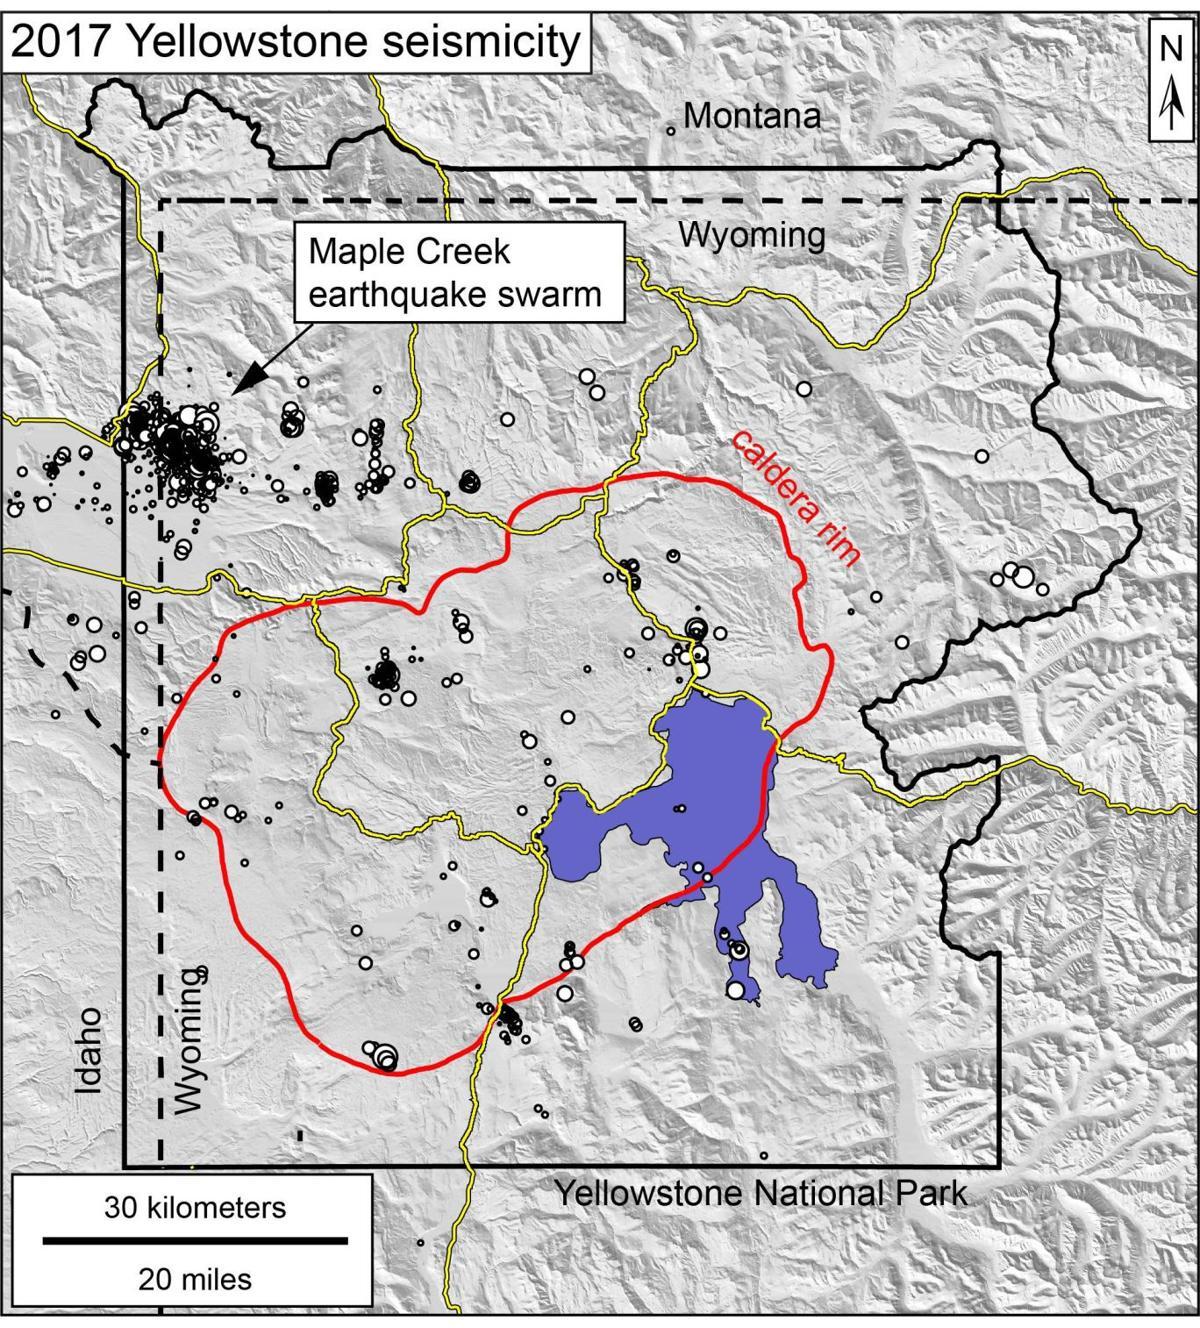 Yellowstone 2017 seismic activity